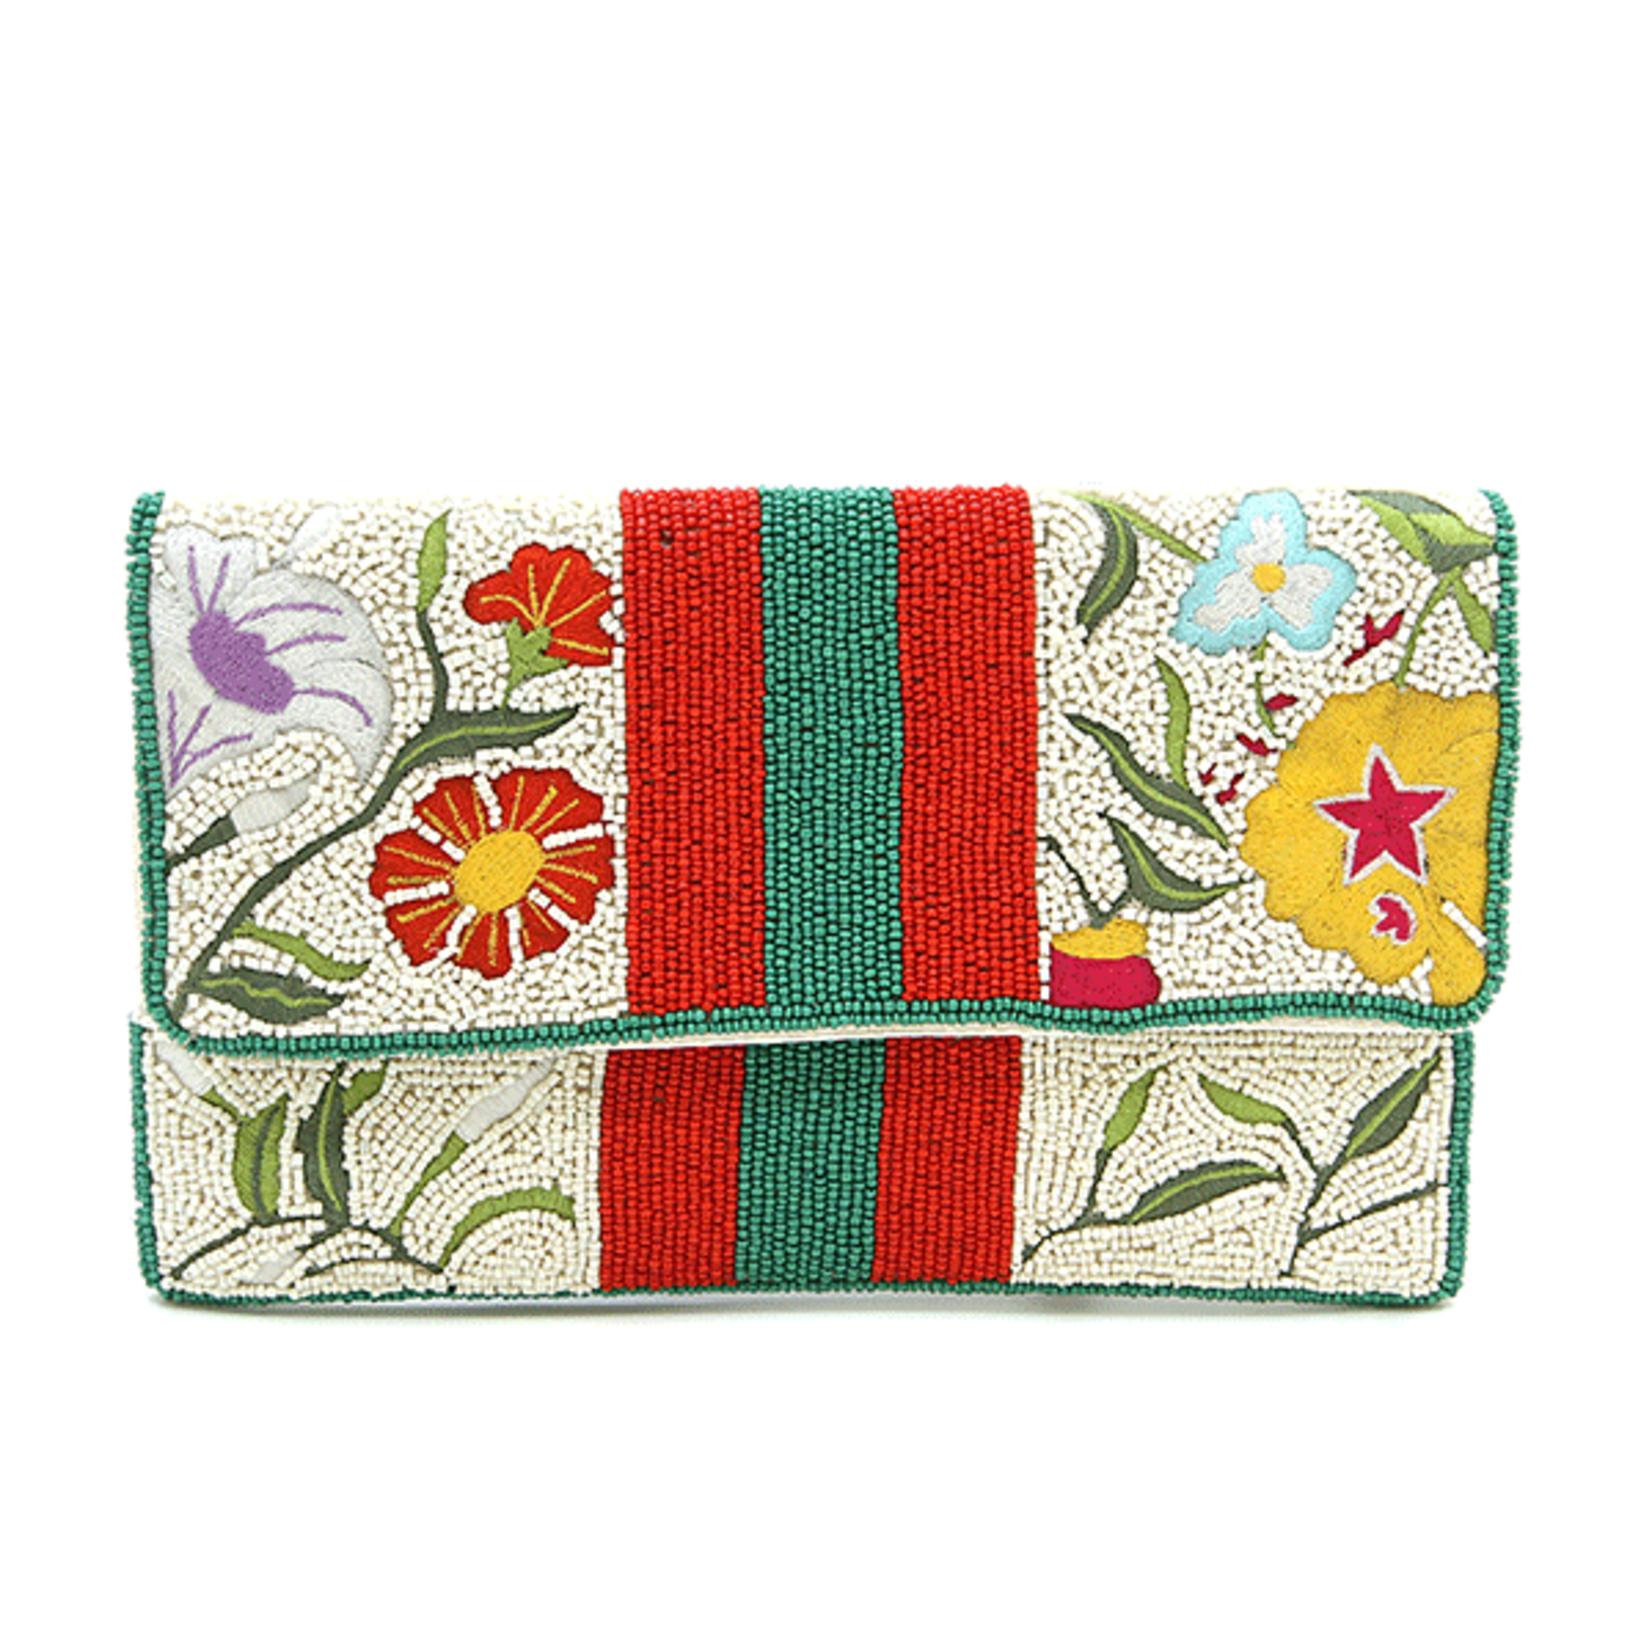 Beaded Clutch -  Multi Floral w/ Stripes